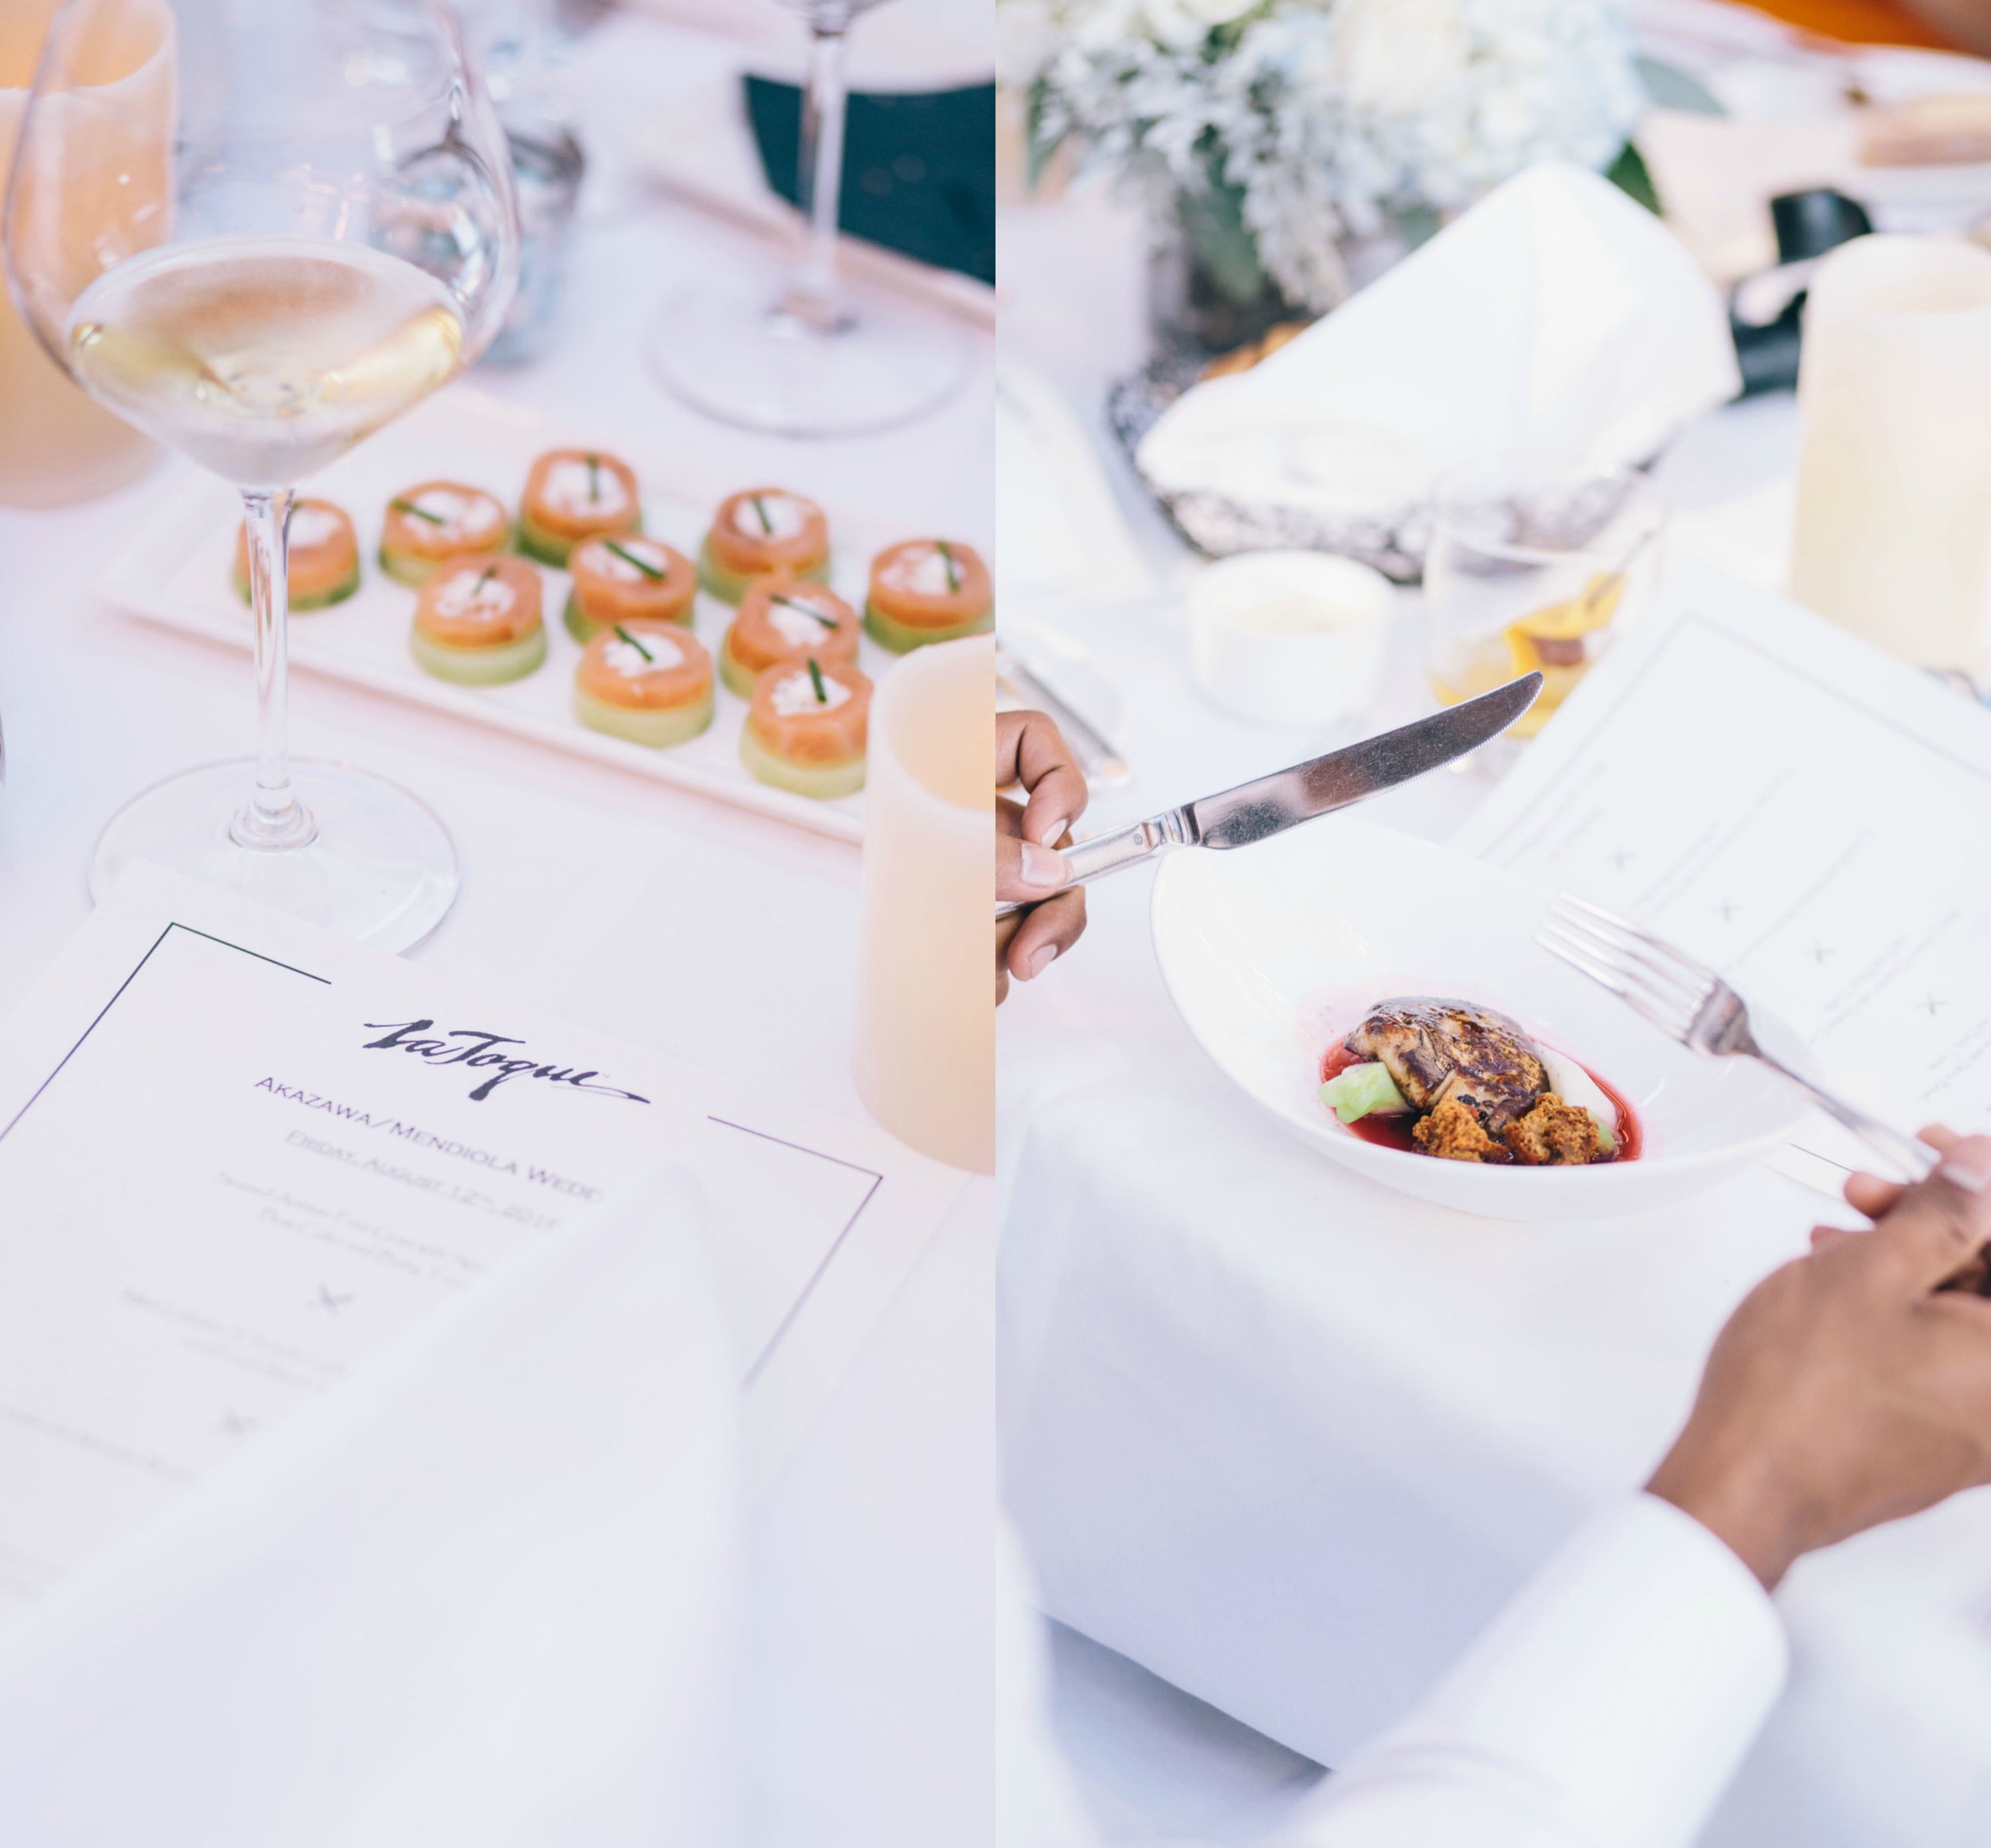 Westin Verasa Wedding at La Toque - JBJ Pictures Wedding Photographer in Napa Sonoma and San Francisco - 1 (30).jpg